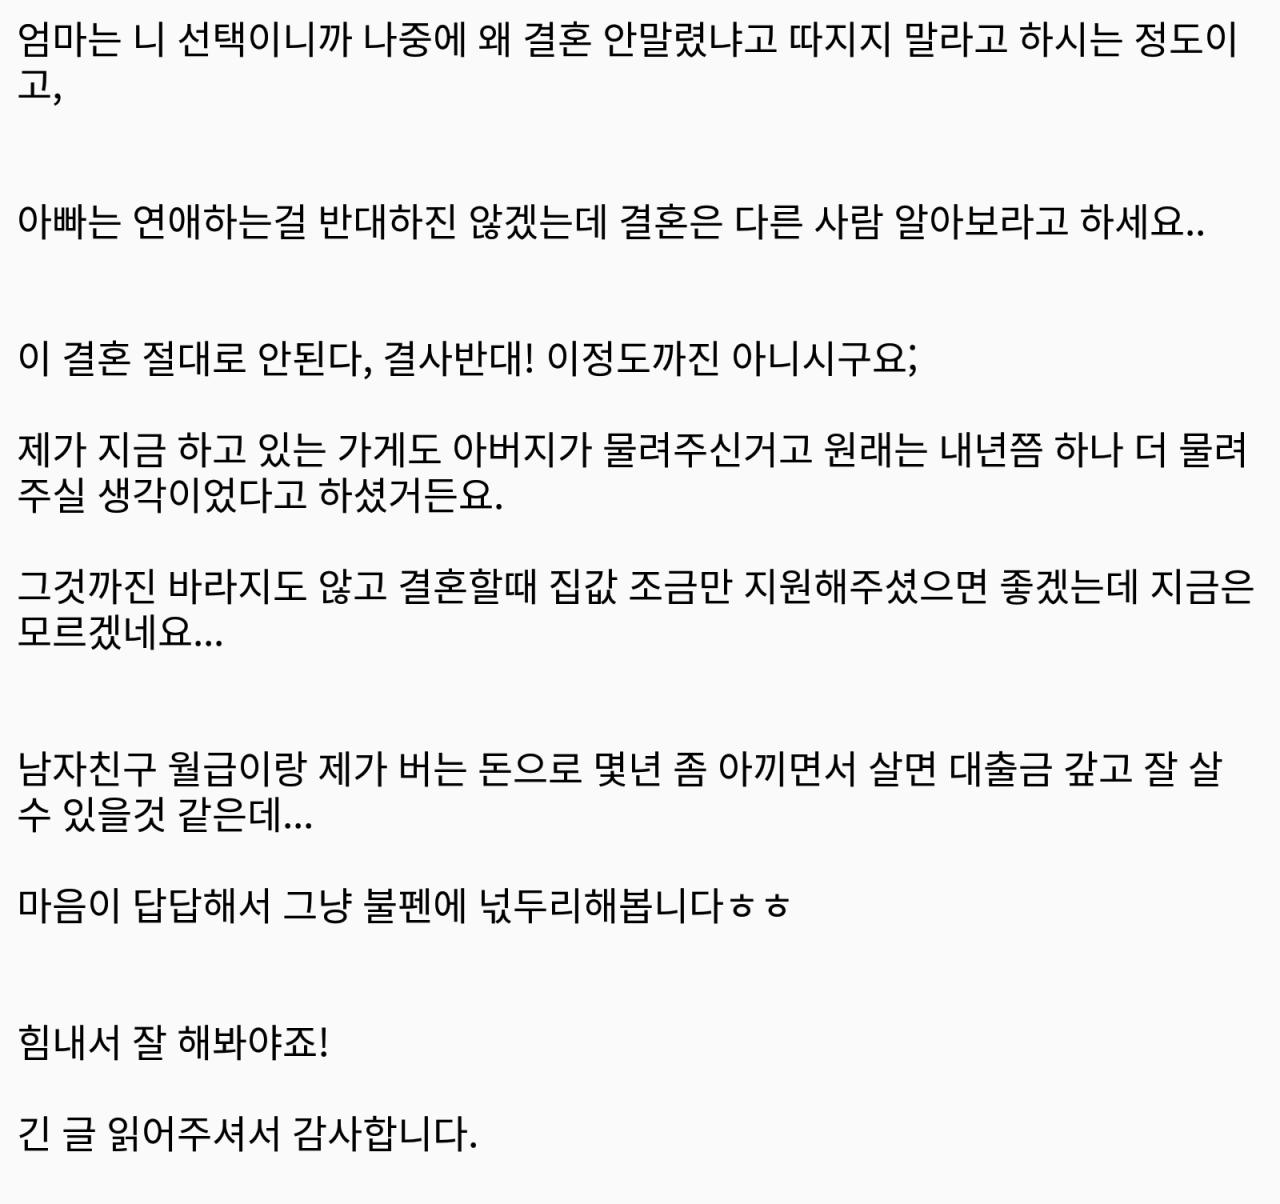 IMG_20180515_133508.png 현재 엠팍에서 댓글 500개 넘긴 예비신부 사연.jpg